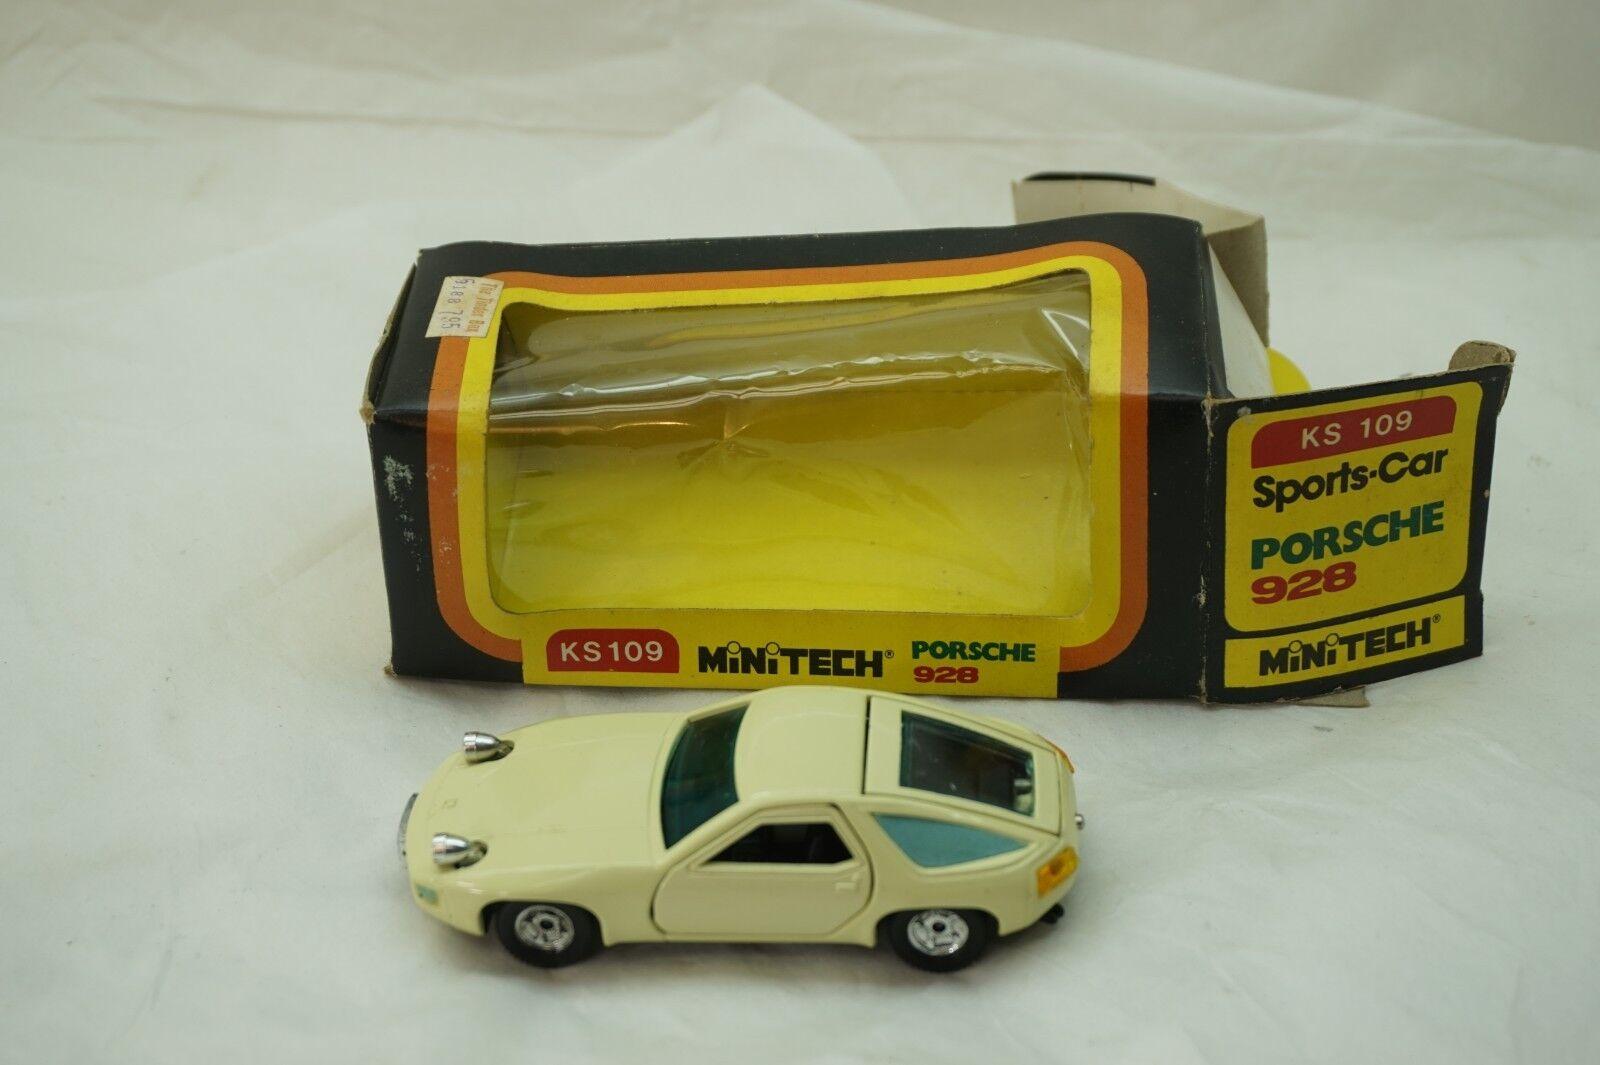 Vintage Voiture Miniature Minitech Mini Tech Porsche 928 KS109 1 43 Echelle